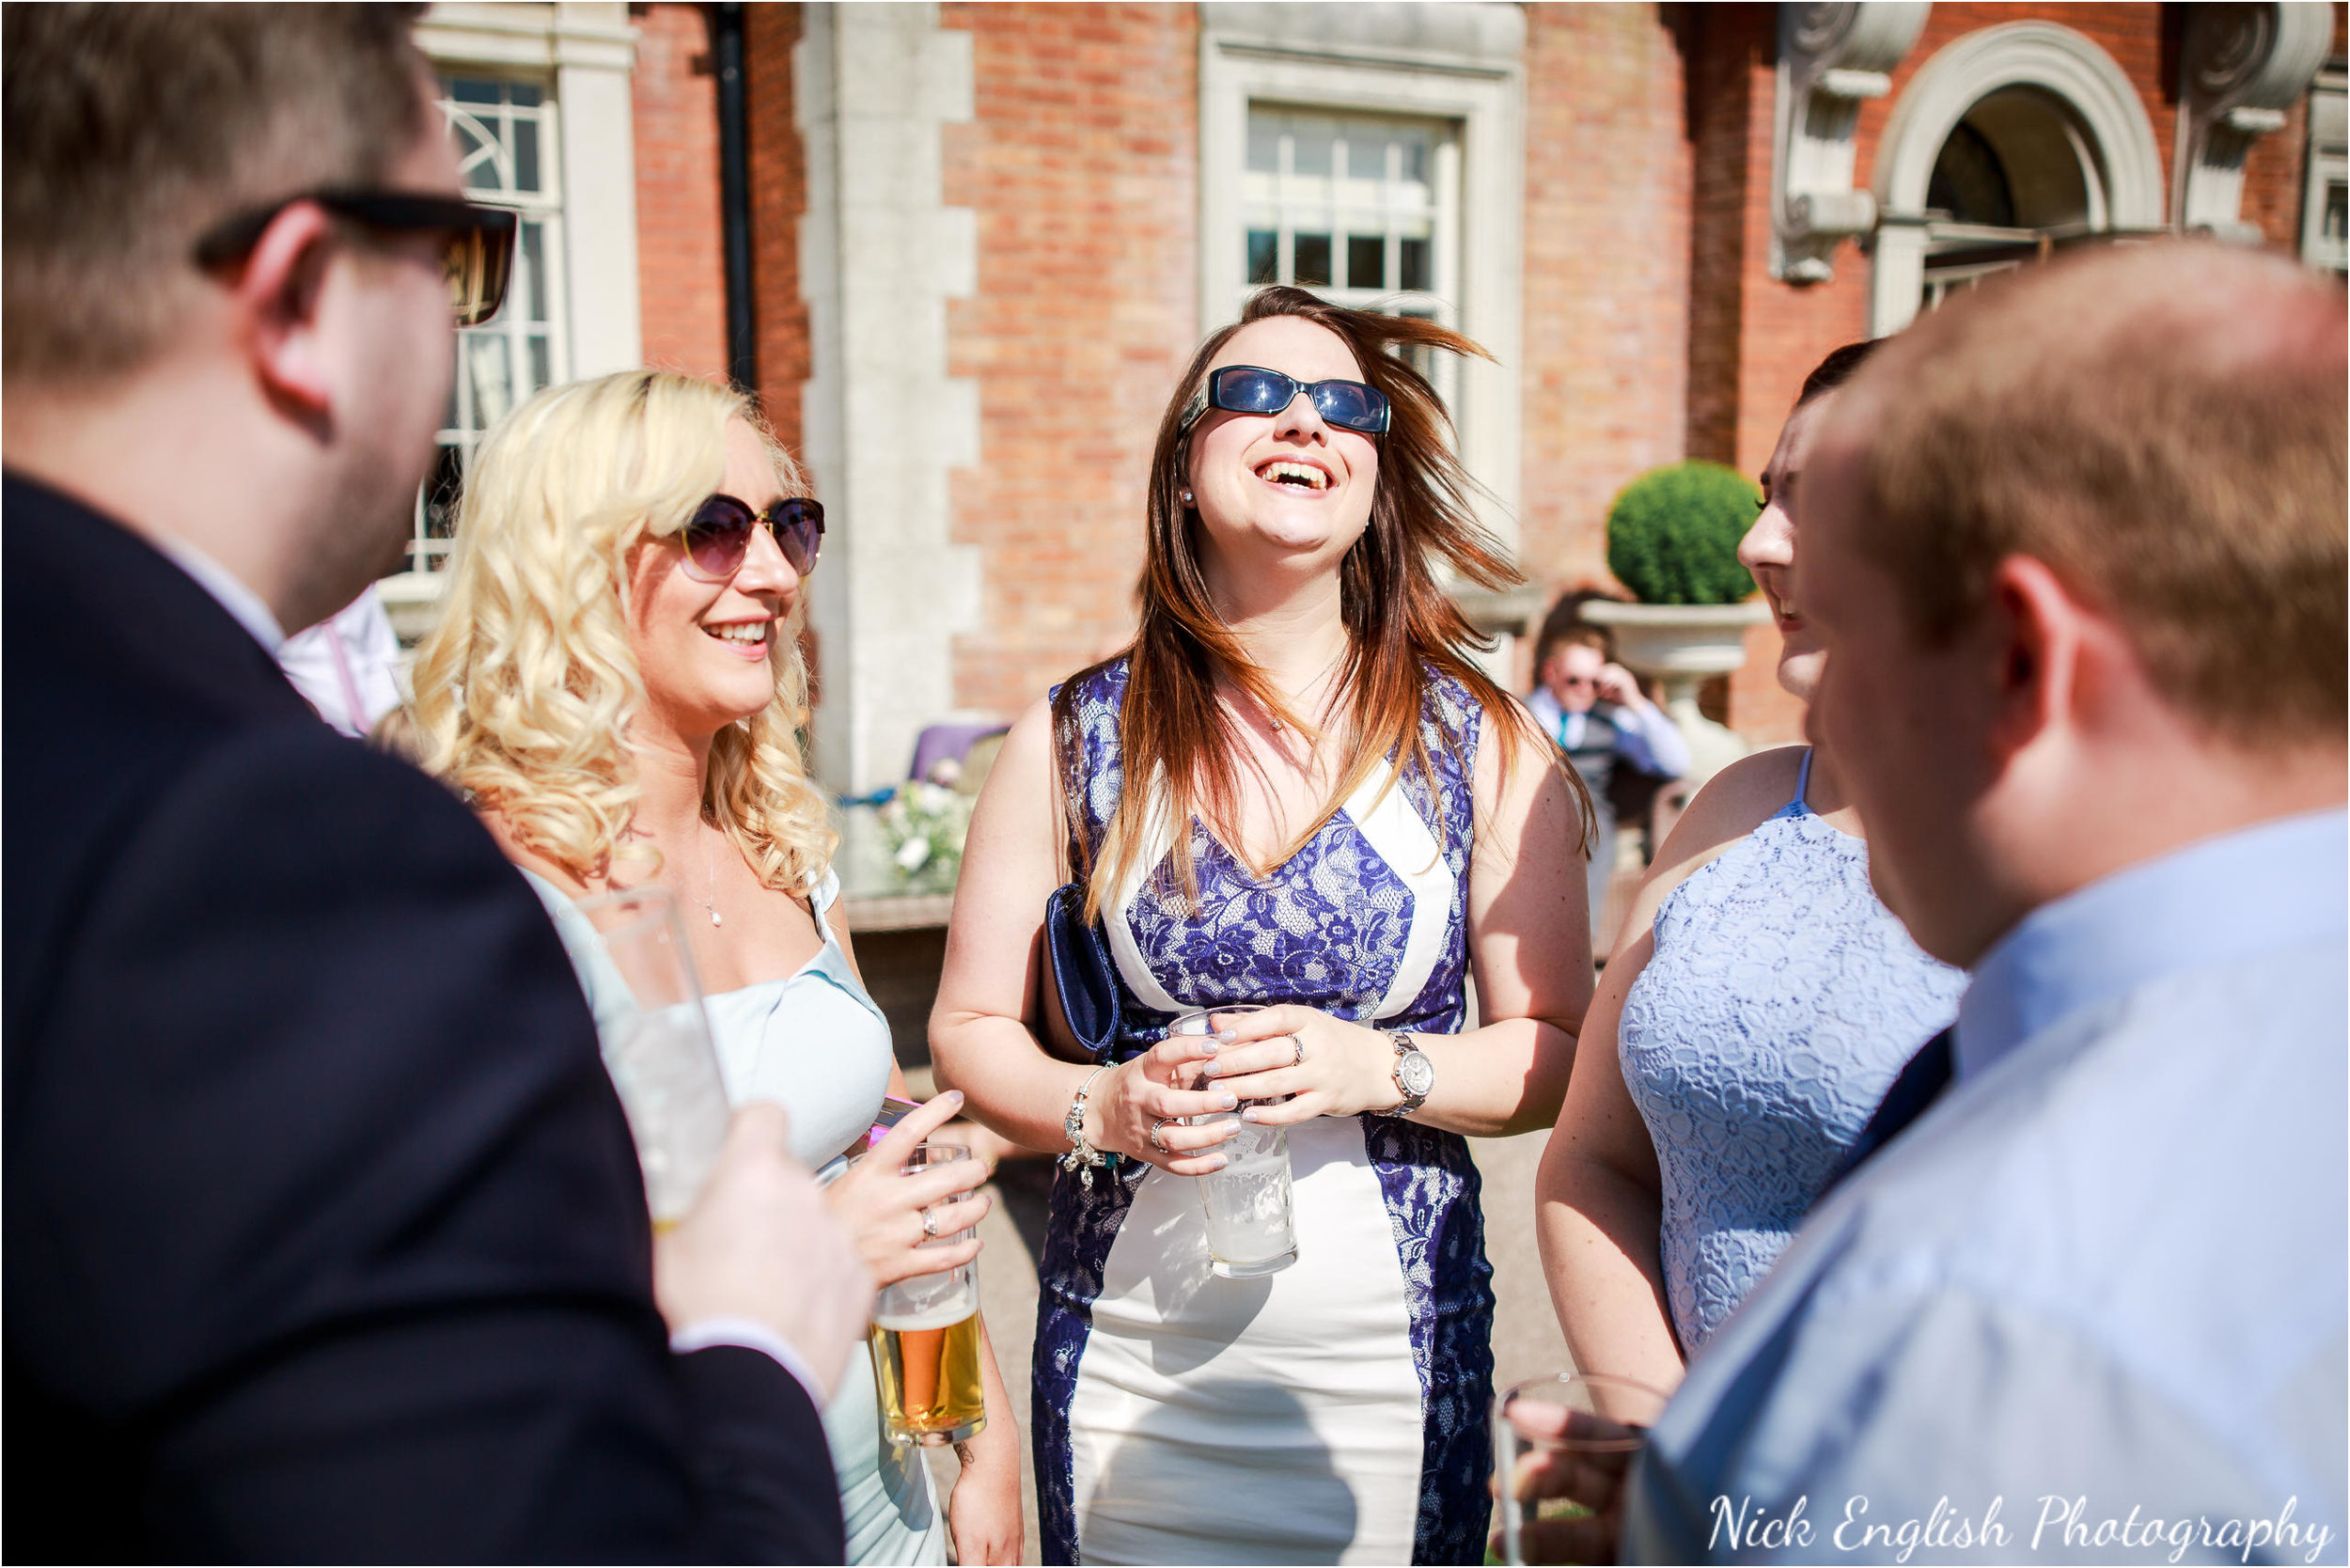 Alison James Wedding Photographs at Eaves Hall West Bradford 158jpg.jpeg